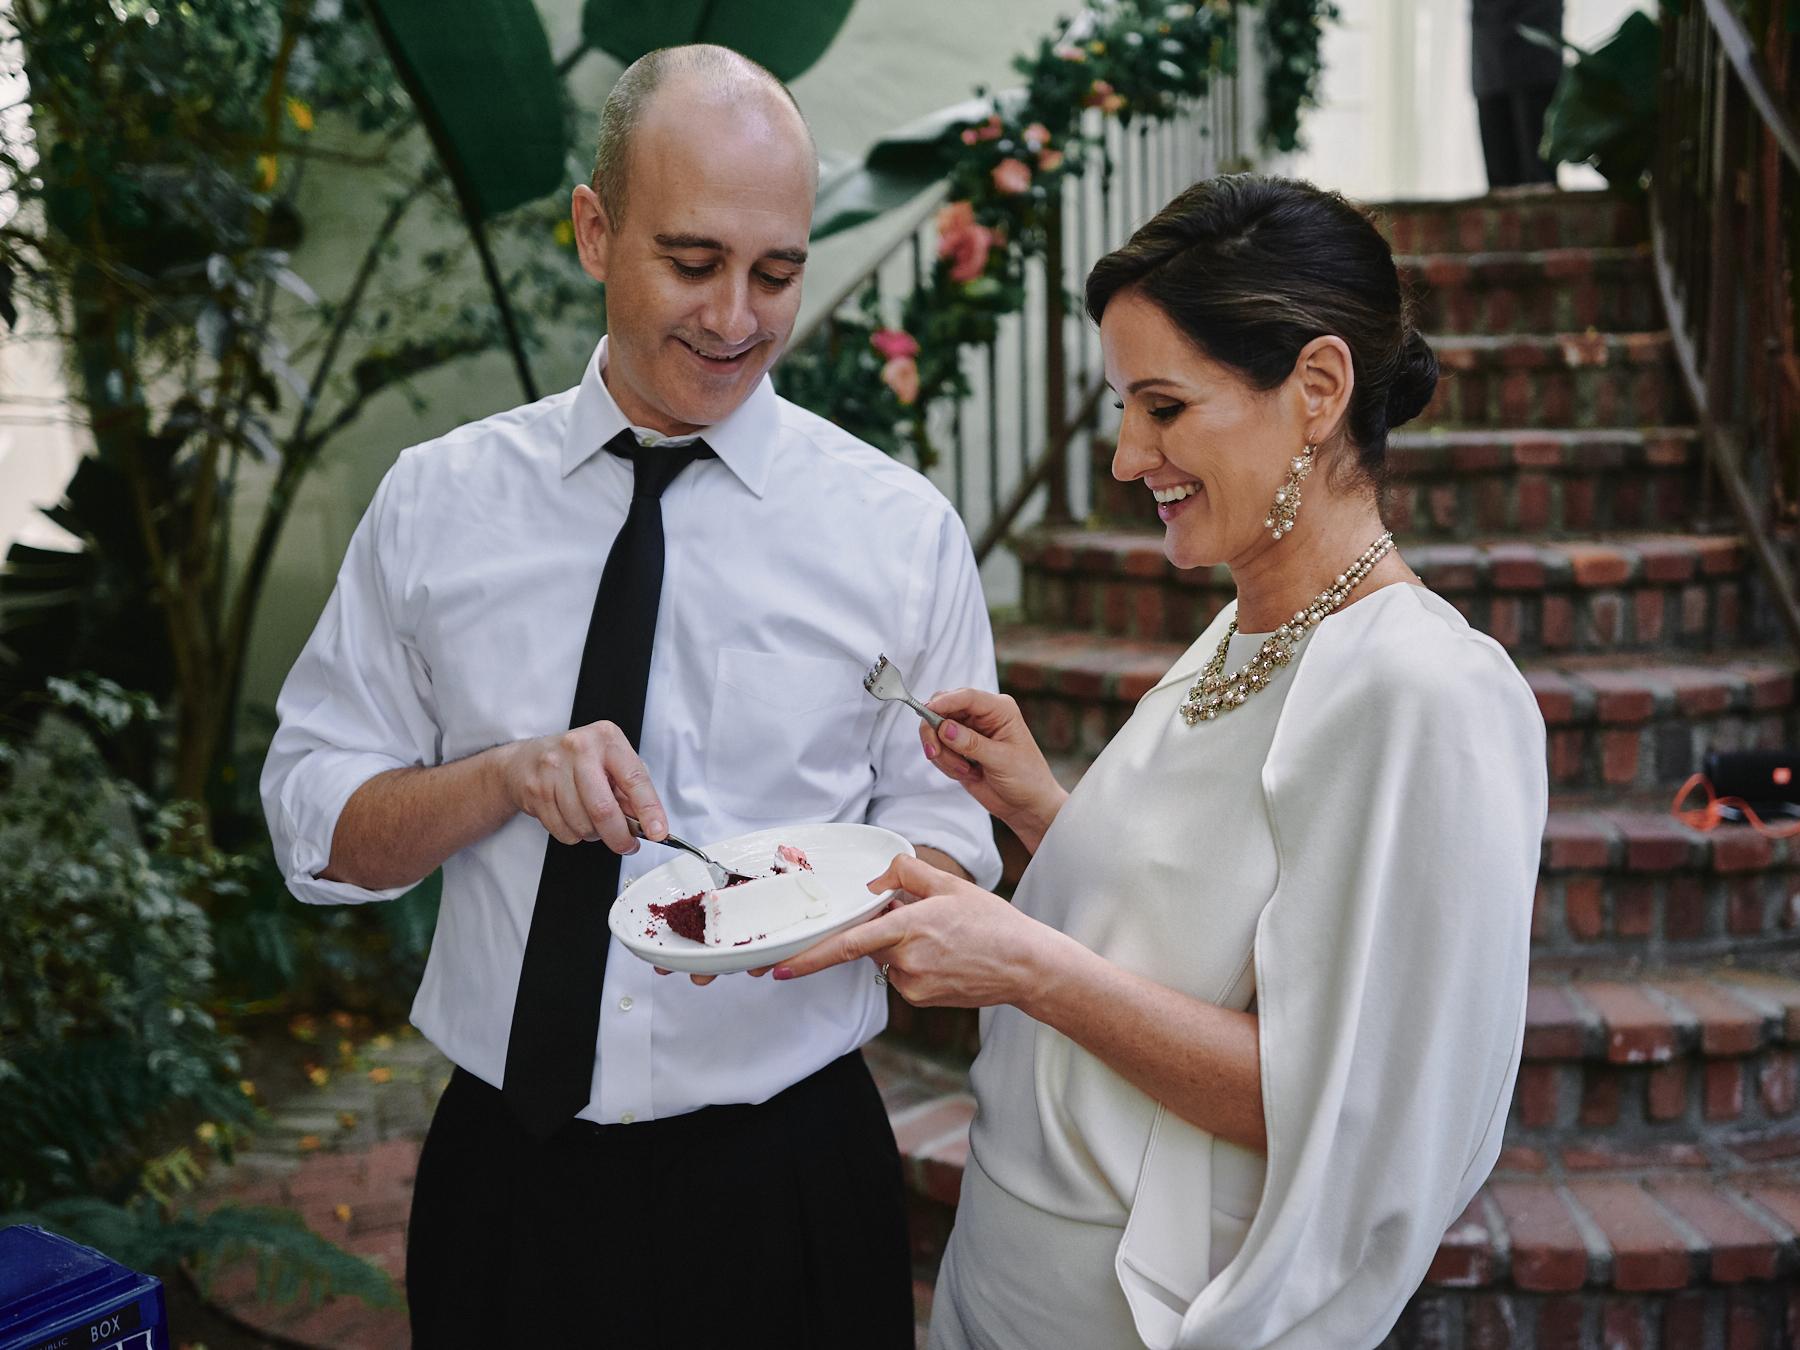 Sunset Marquis wedding cake cutting West Hollywood